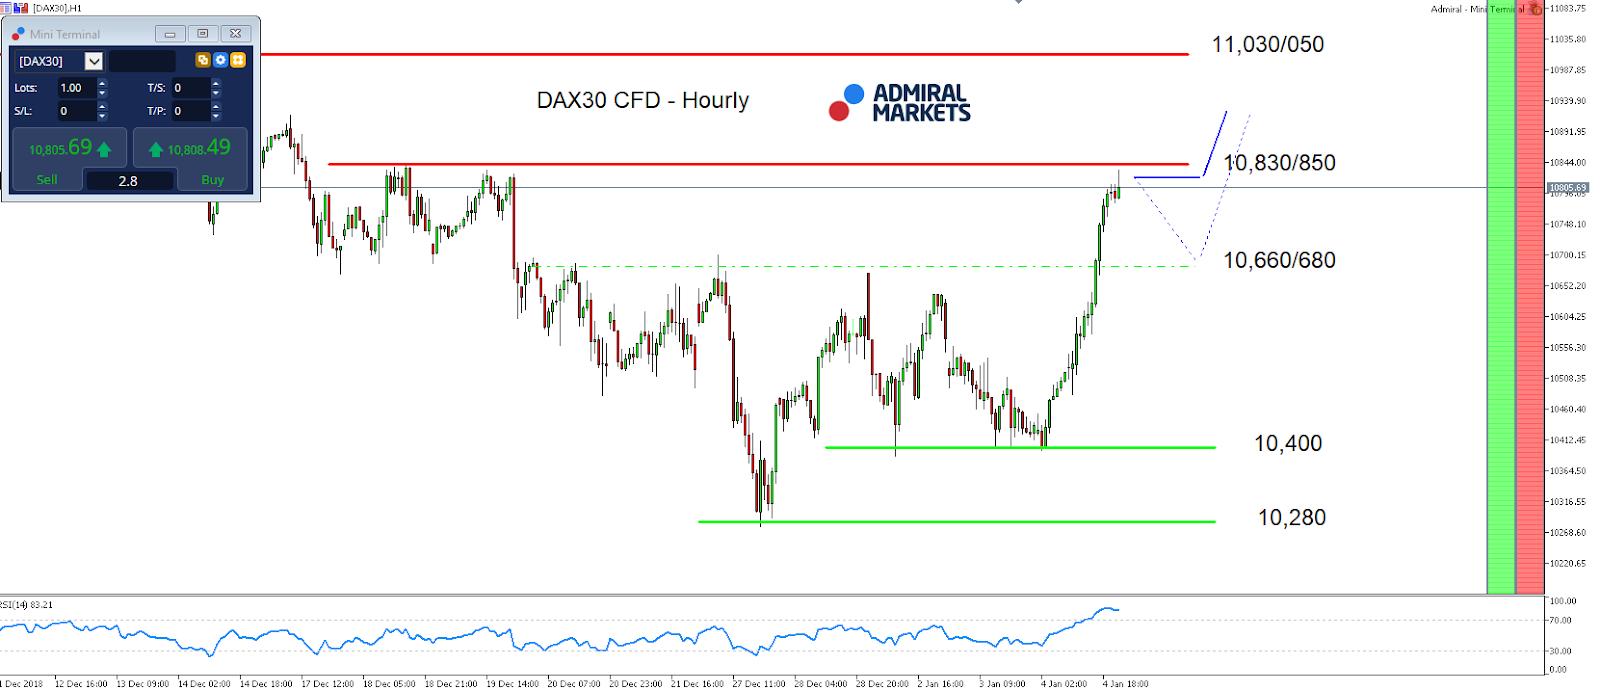 DAX30 Hourly Chart